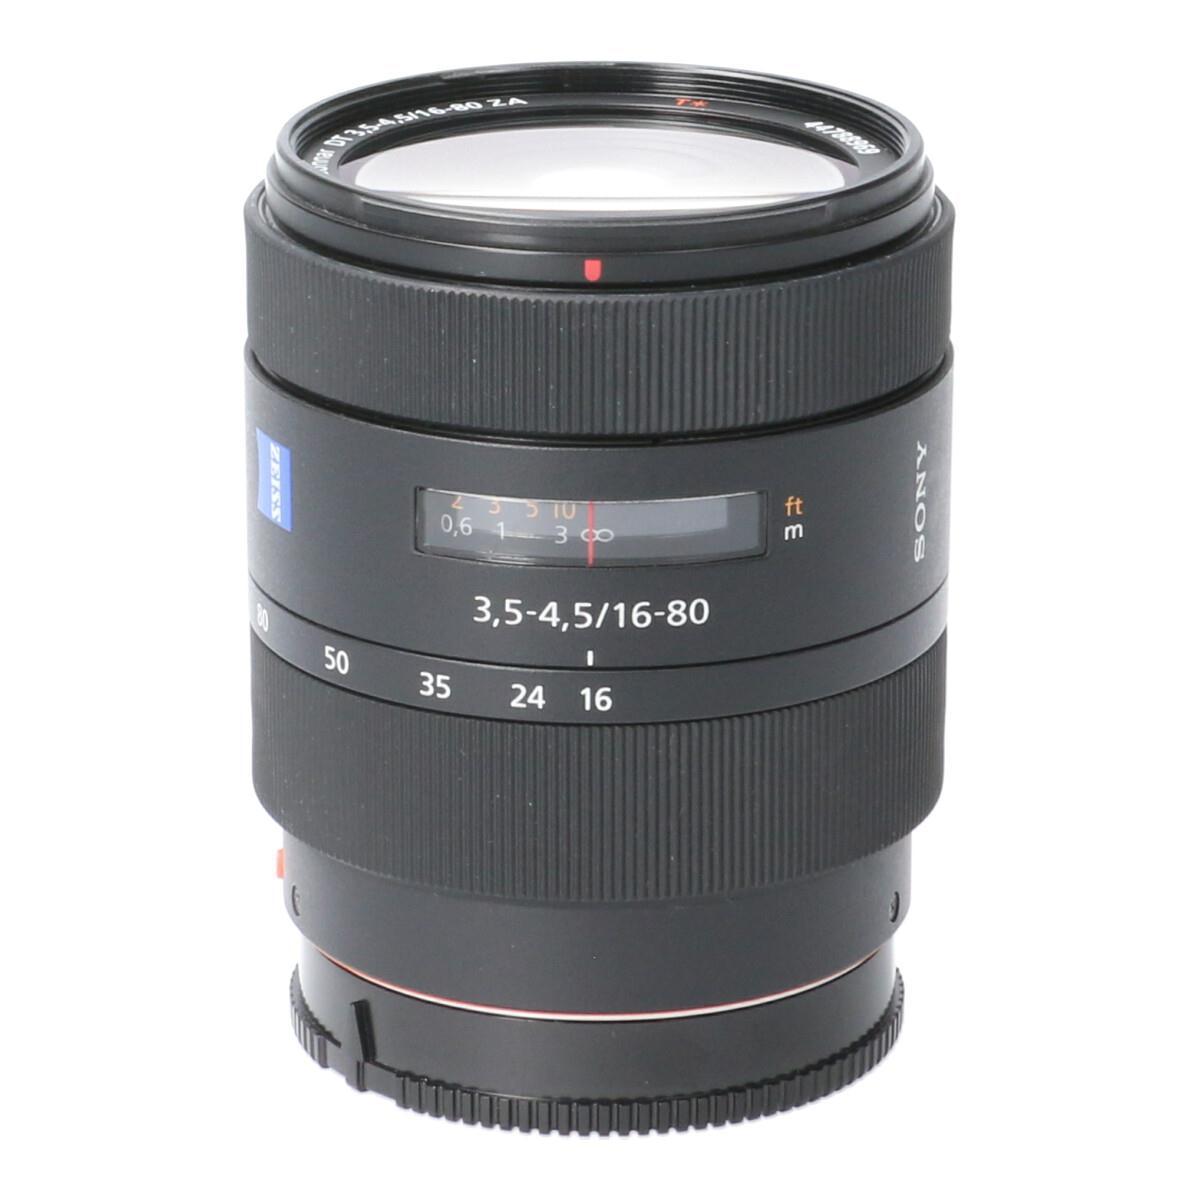 SONY DT16-80mm F3.5-4.5ZA【中古】